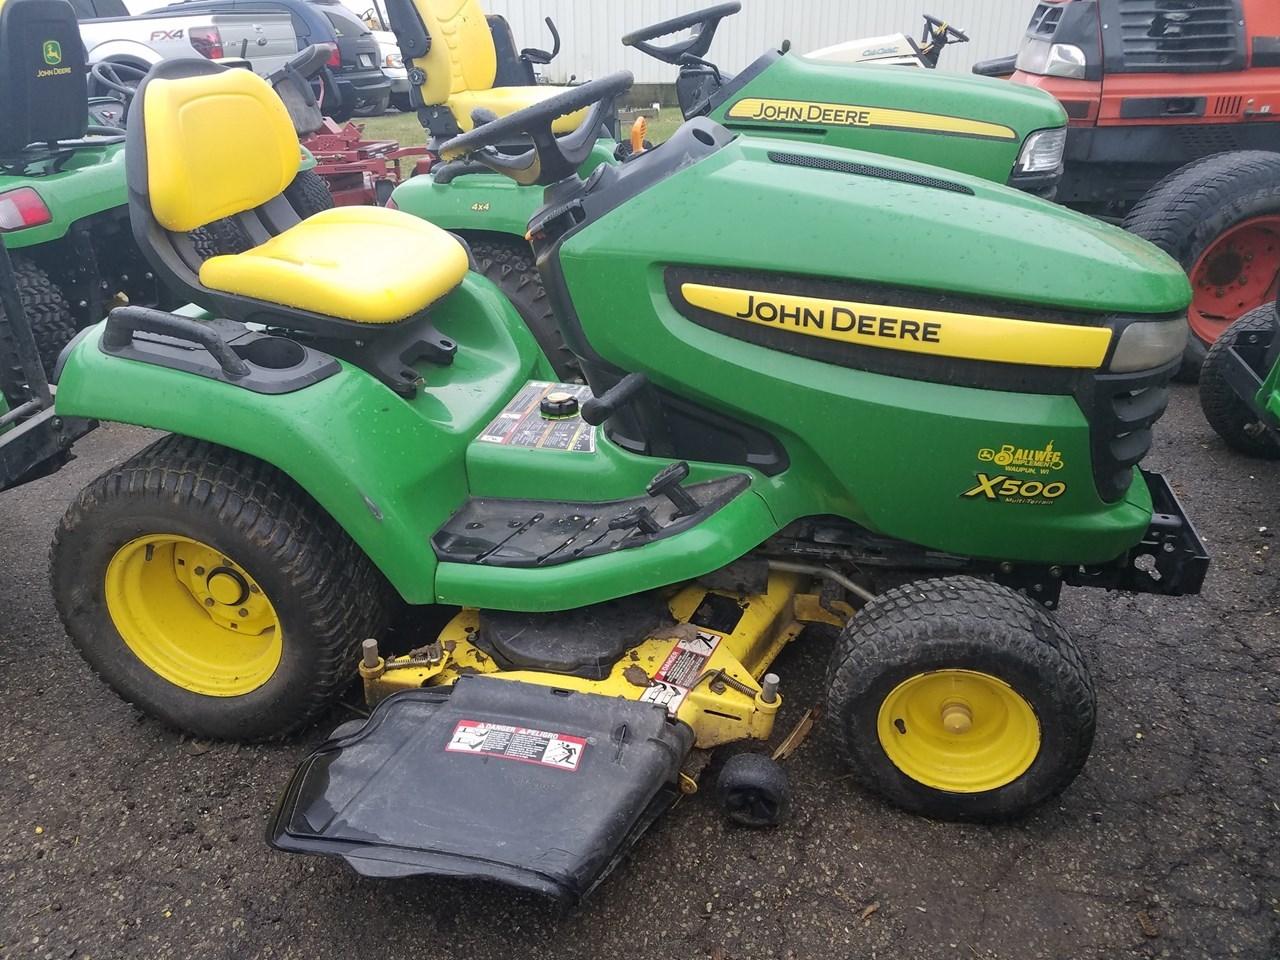 2006 John Deere X500 Riding Mower For Sale